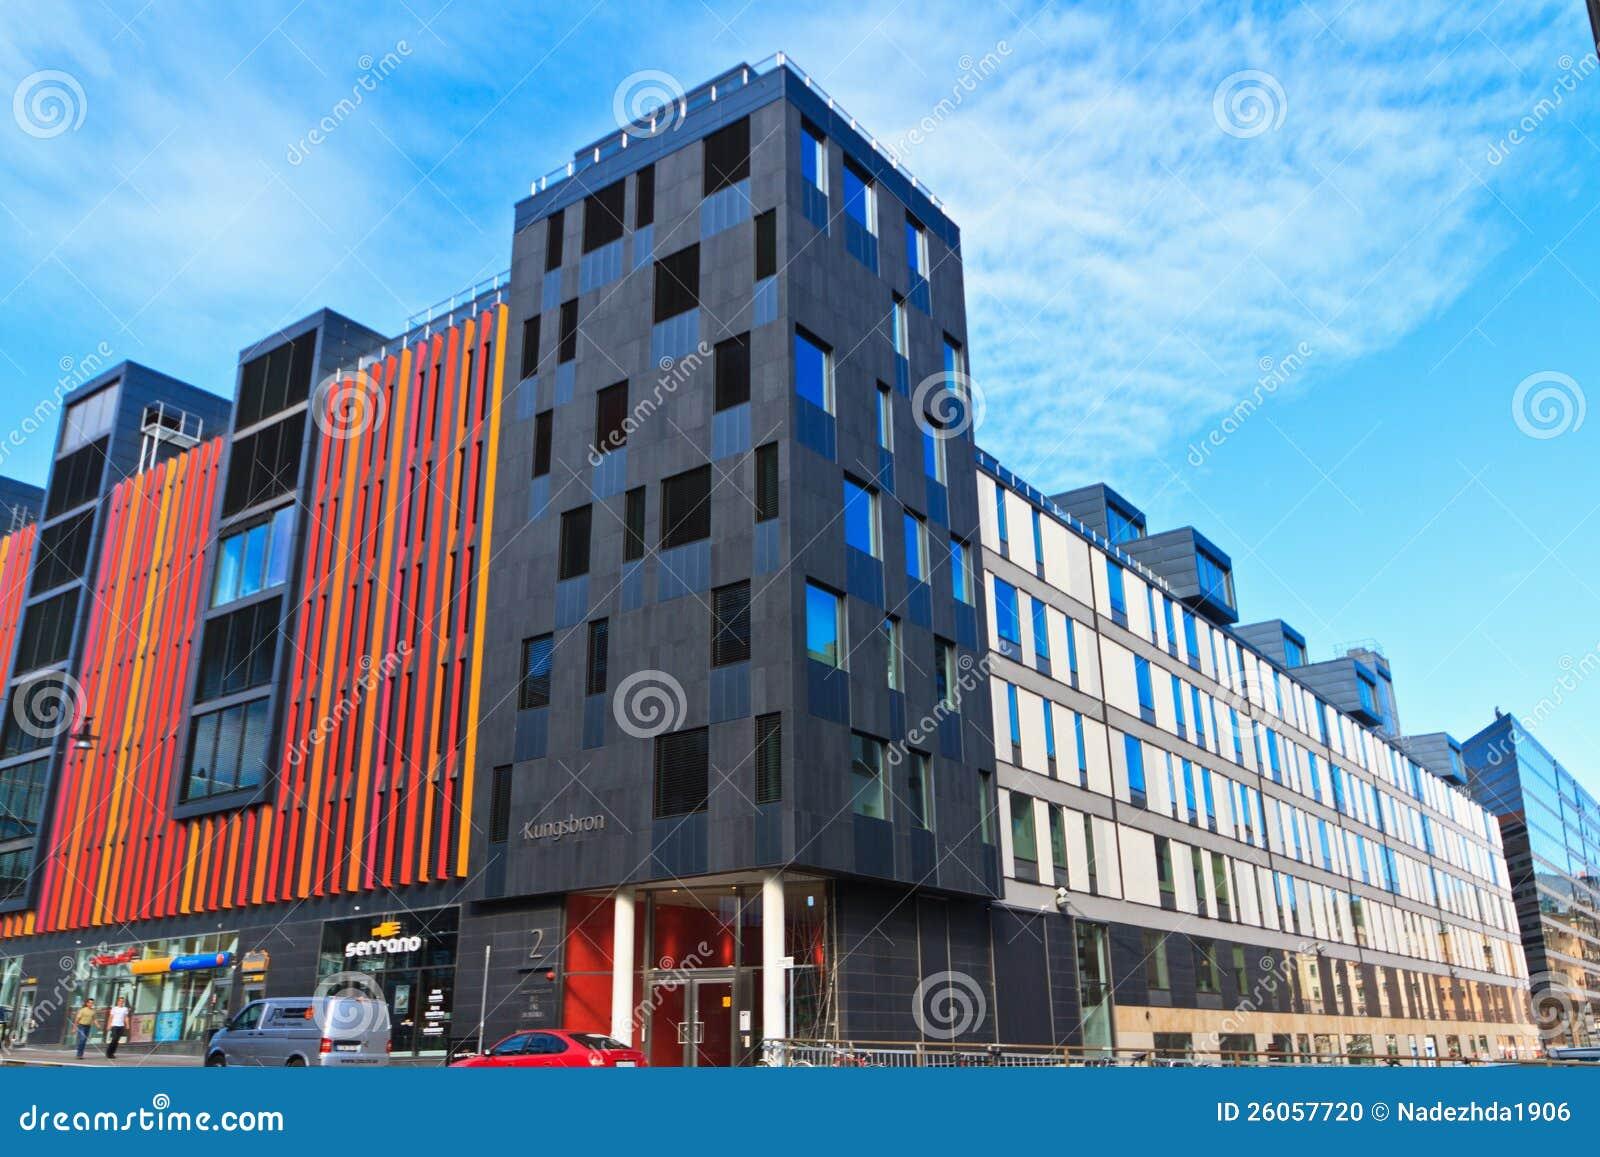 Fassade modern hotel  Moderne Architektur Stockholm Redaktionelles Bild - Bild: 26057720